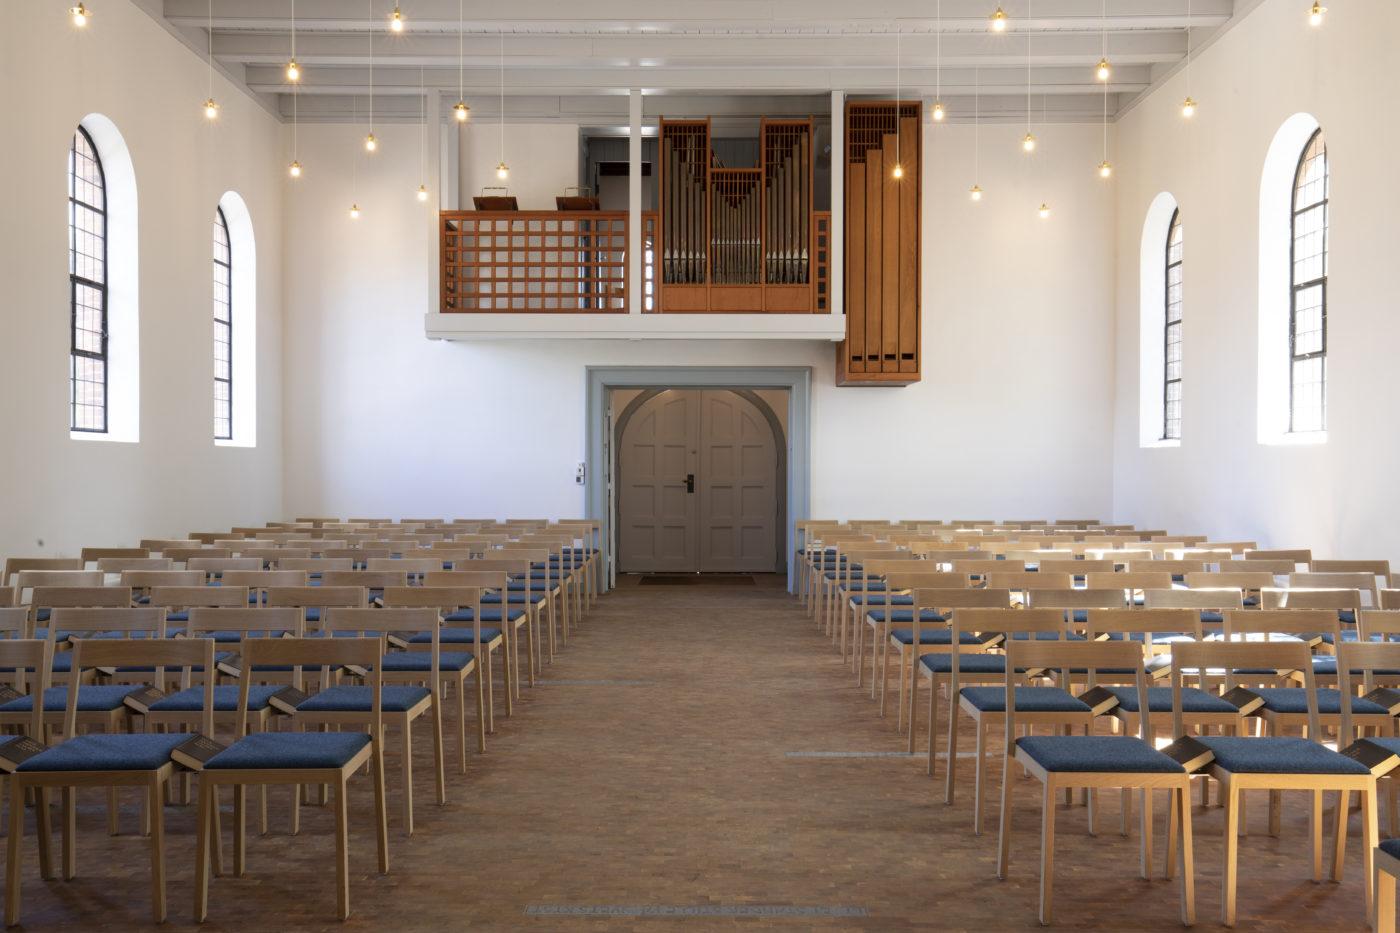 Nyhuse Chapel interior organ Elgaard Architecture